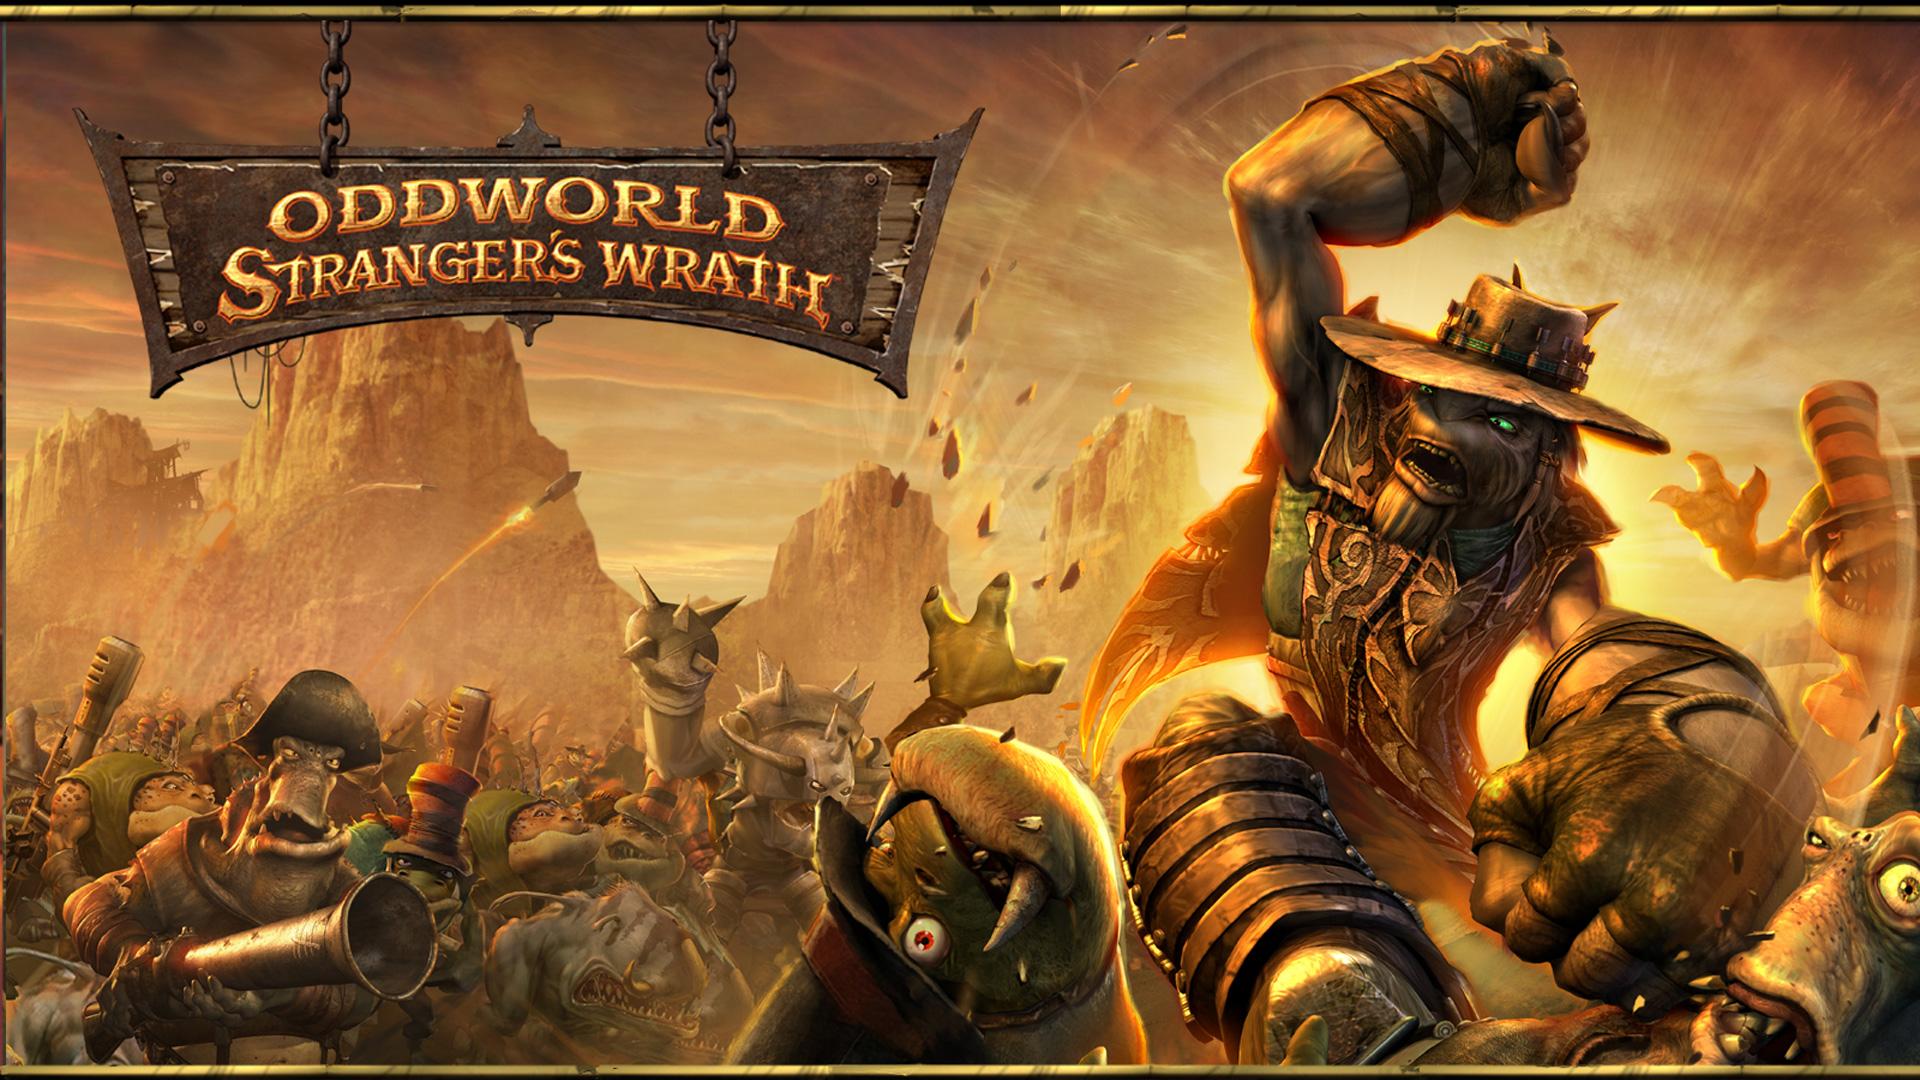 Oddworld-Strangers-Wrath